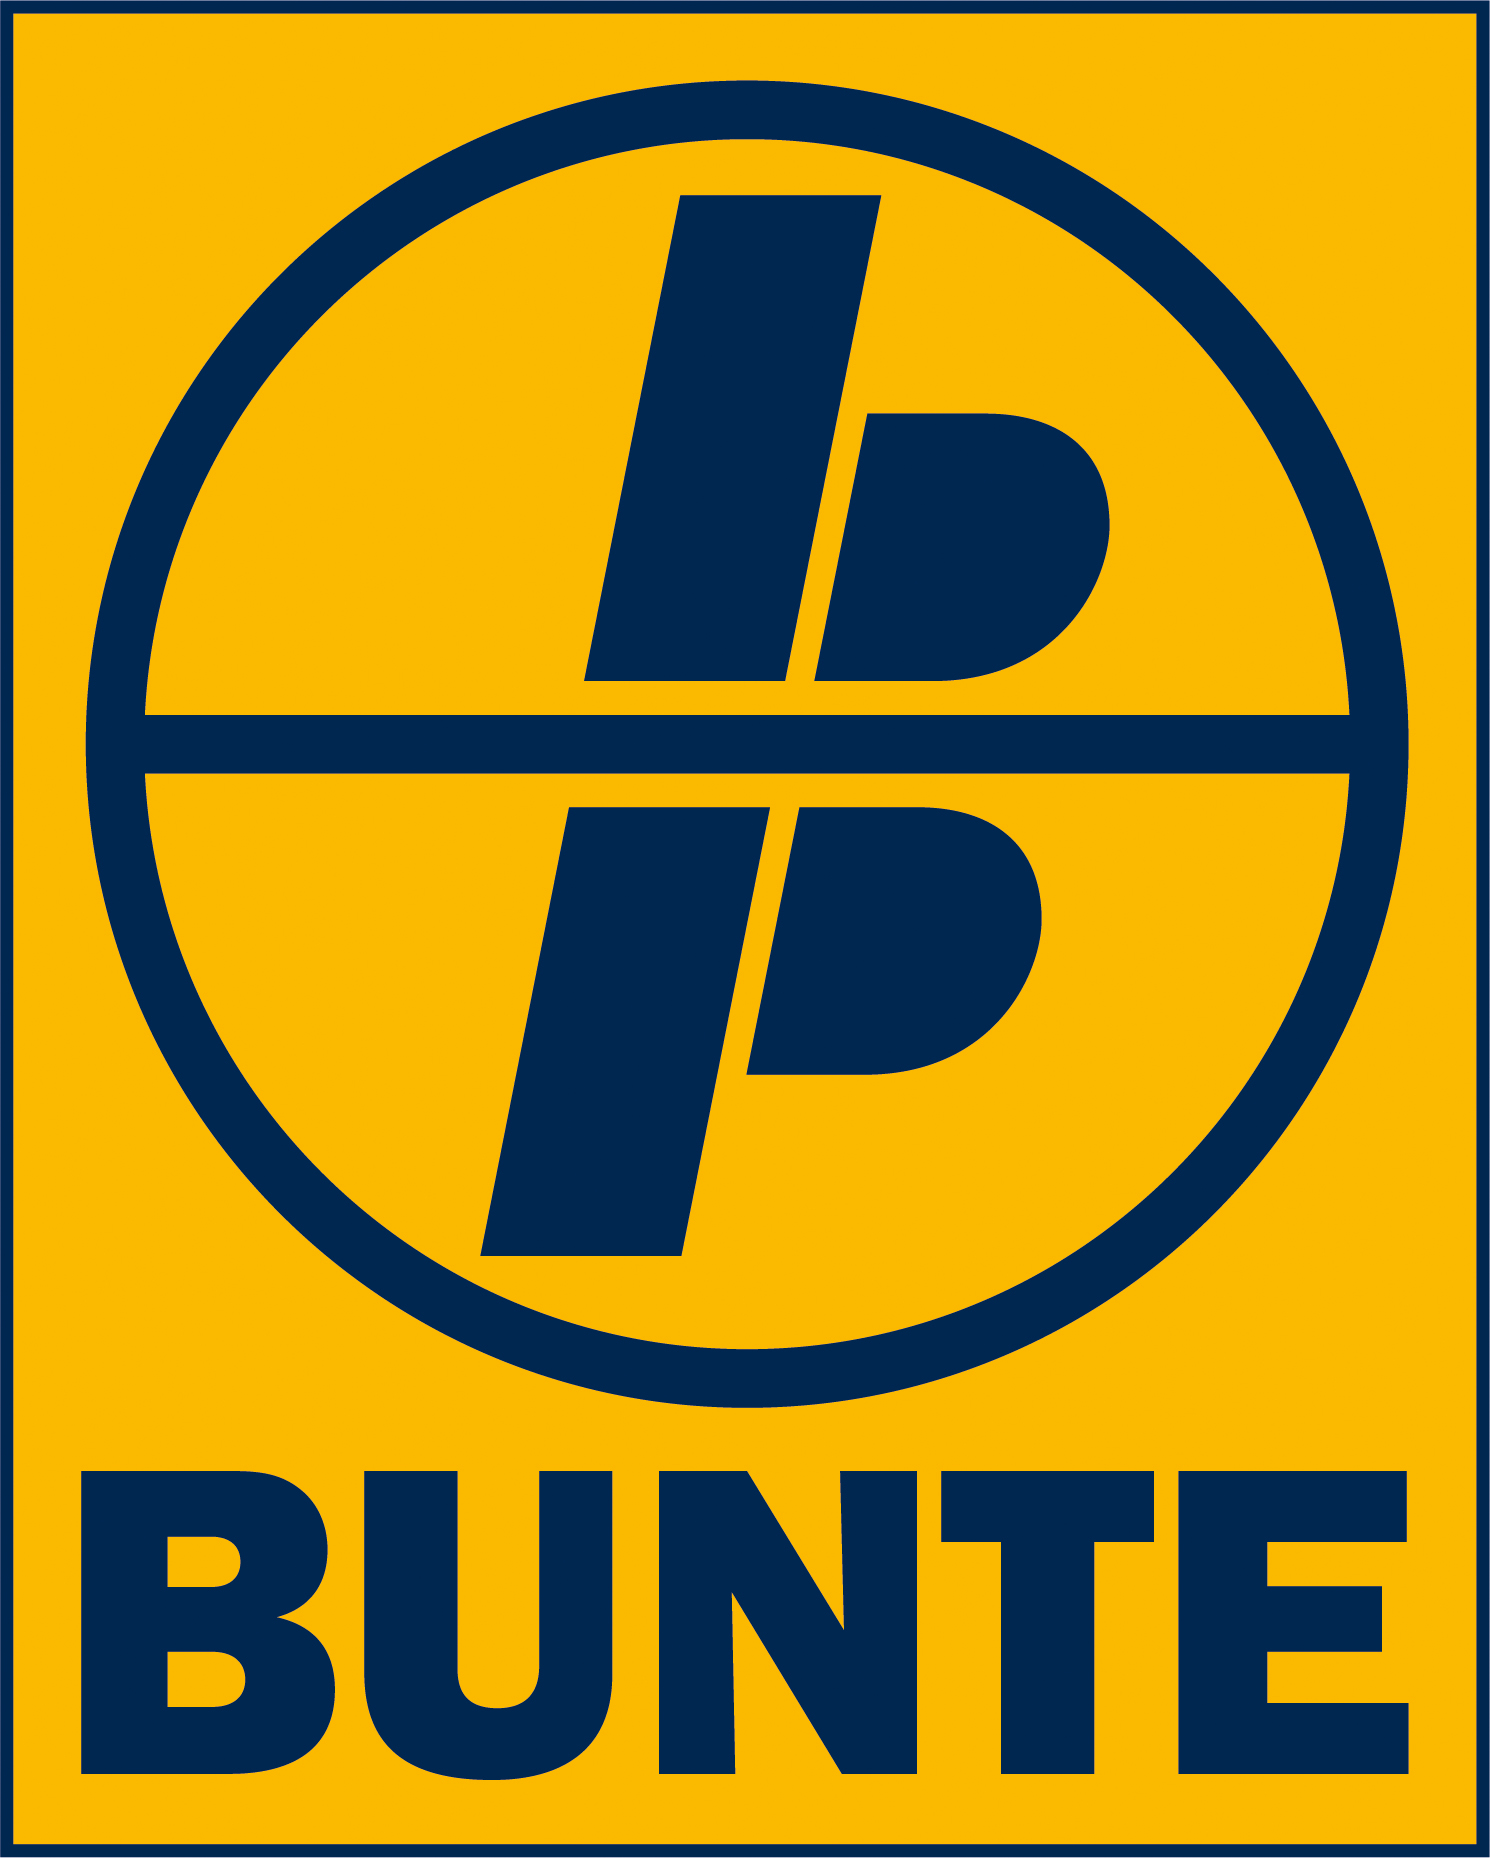 JOHANN BUNTE Bauunternehmung GmbH & Co. KG